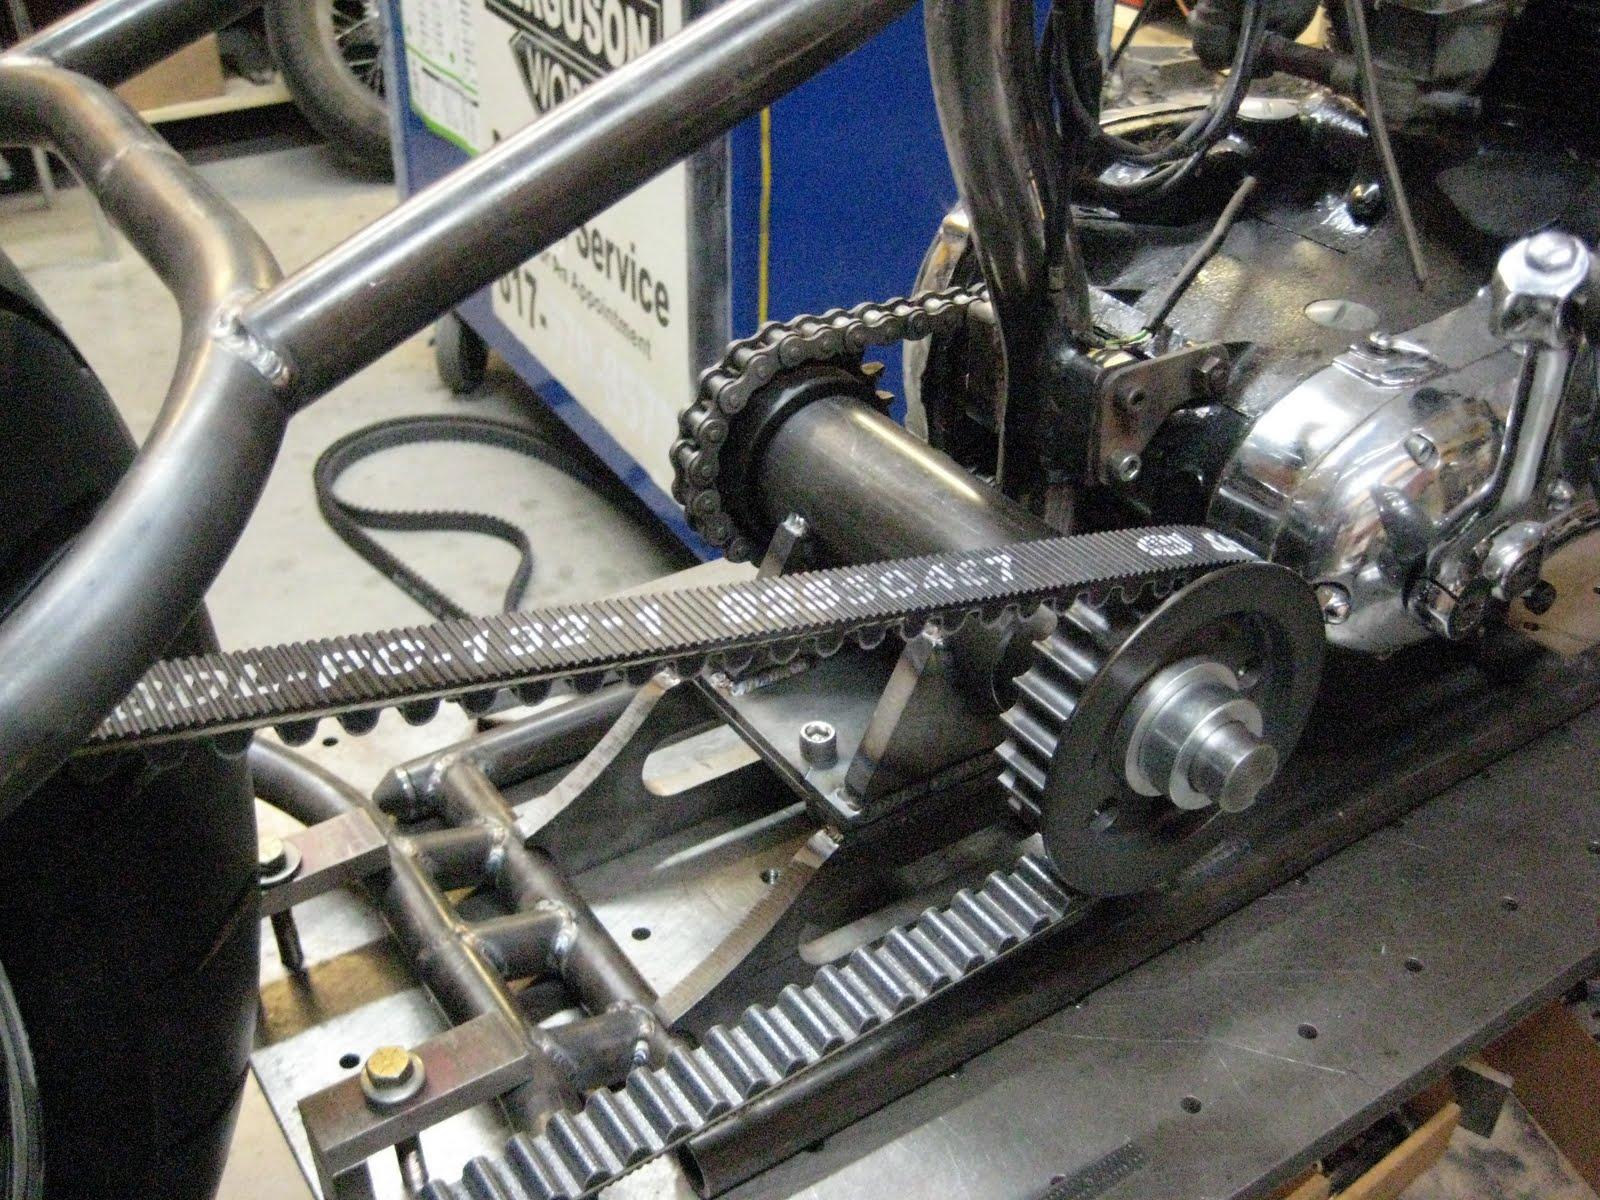 Texas Bike Works Triumph Project